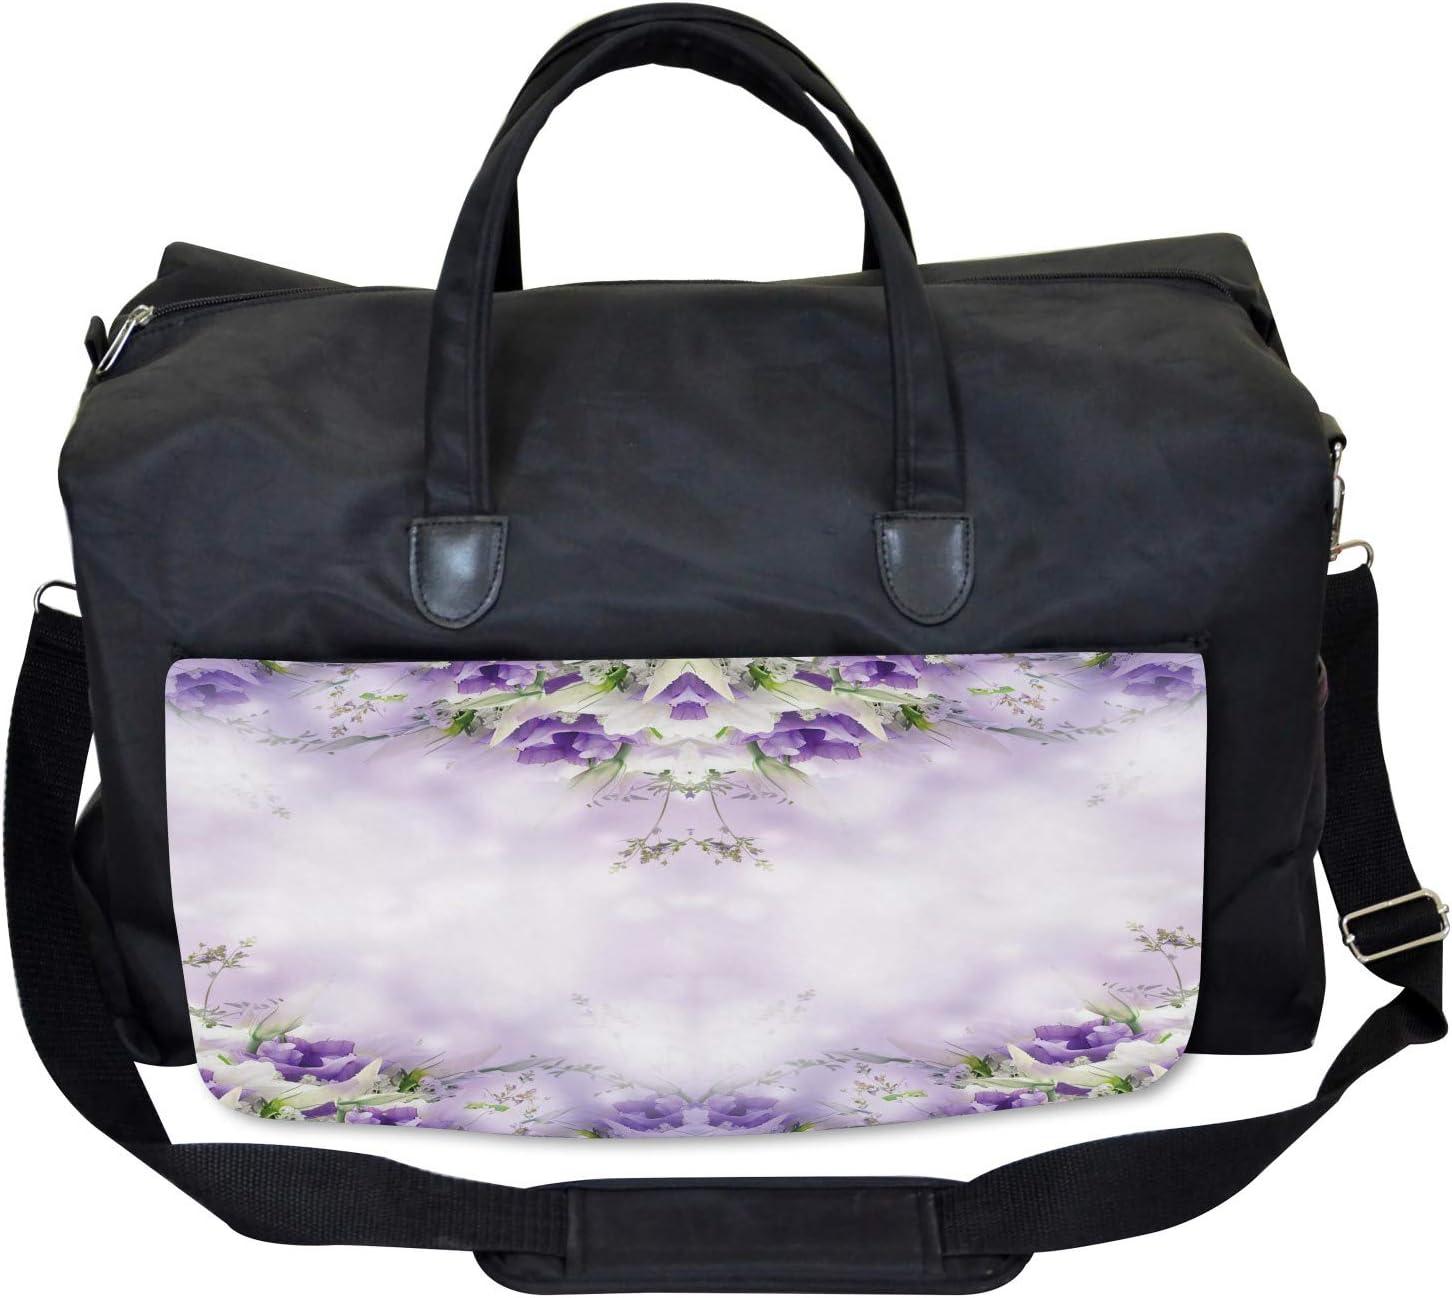 Large Weekender Carry-on Ambesonne Floral Gym Bag Spring Flower Bloom